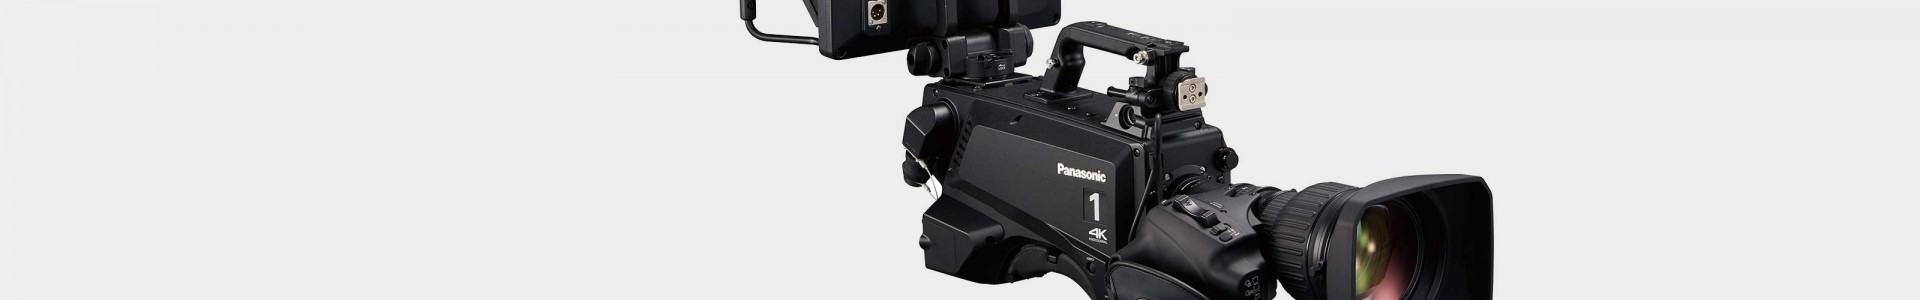 Professional and Broadcast studio cameras - Avacab Audiovisuales